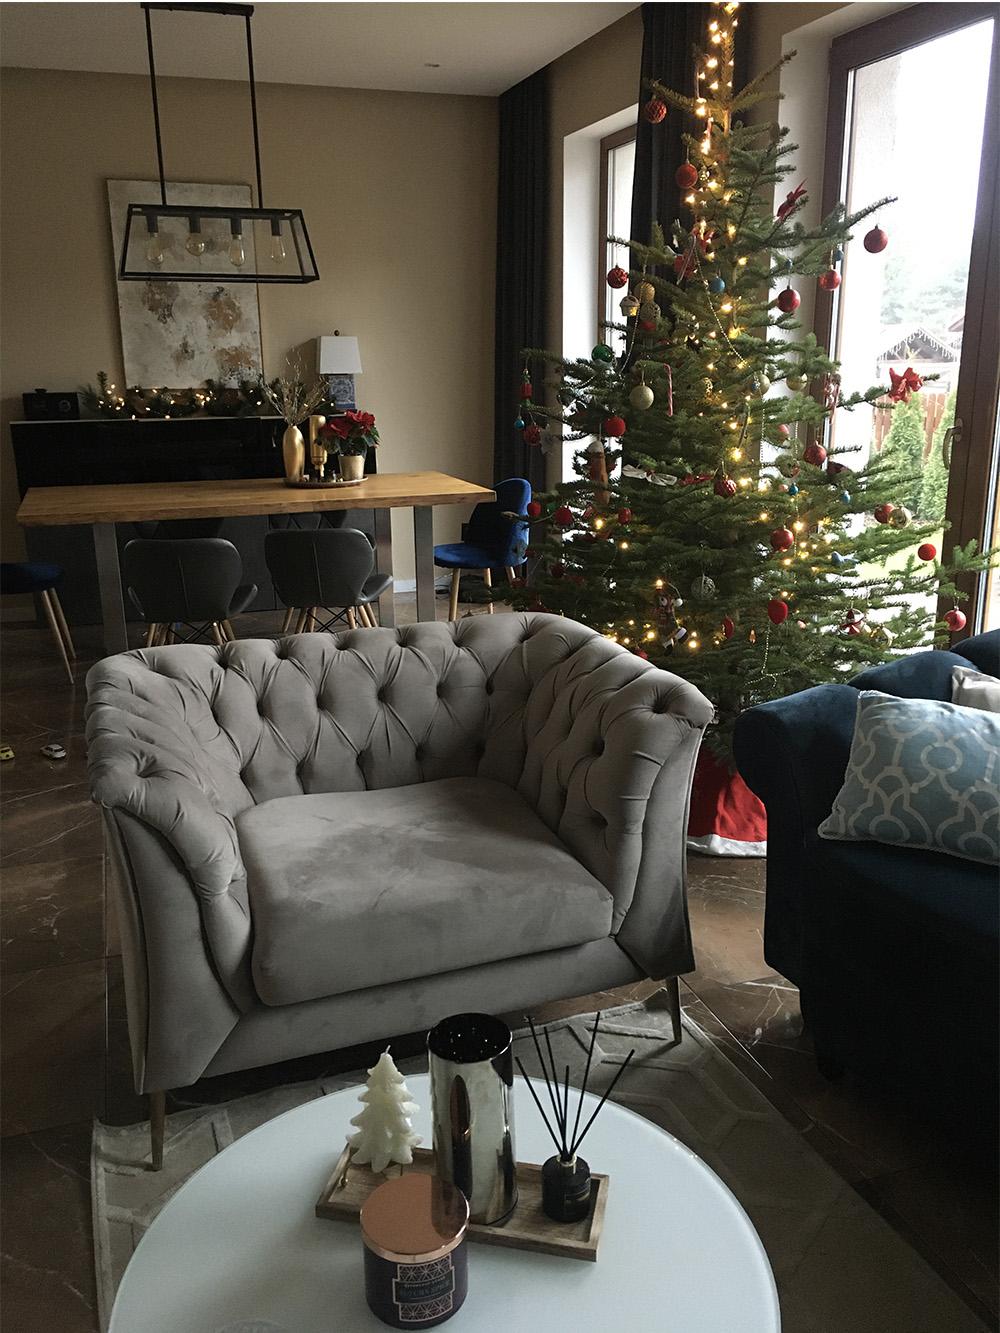 Grey Chesterfield Modern armchair in a festive arrangement